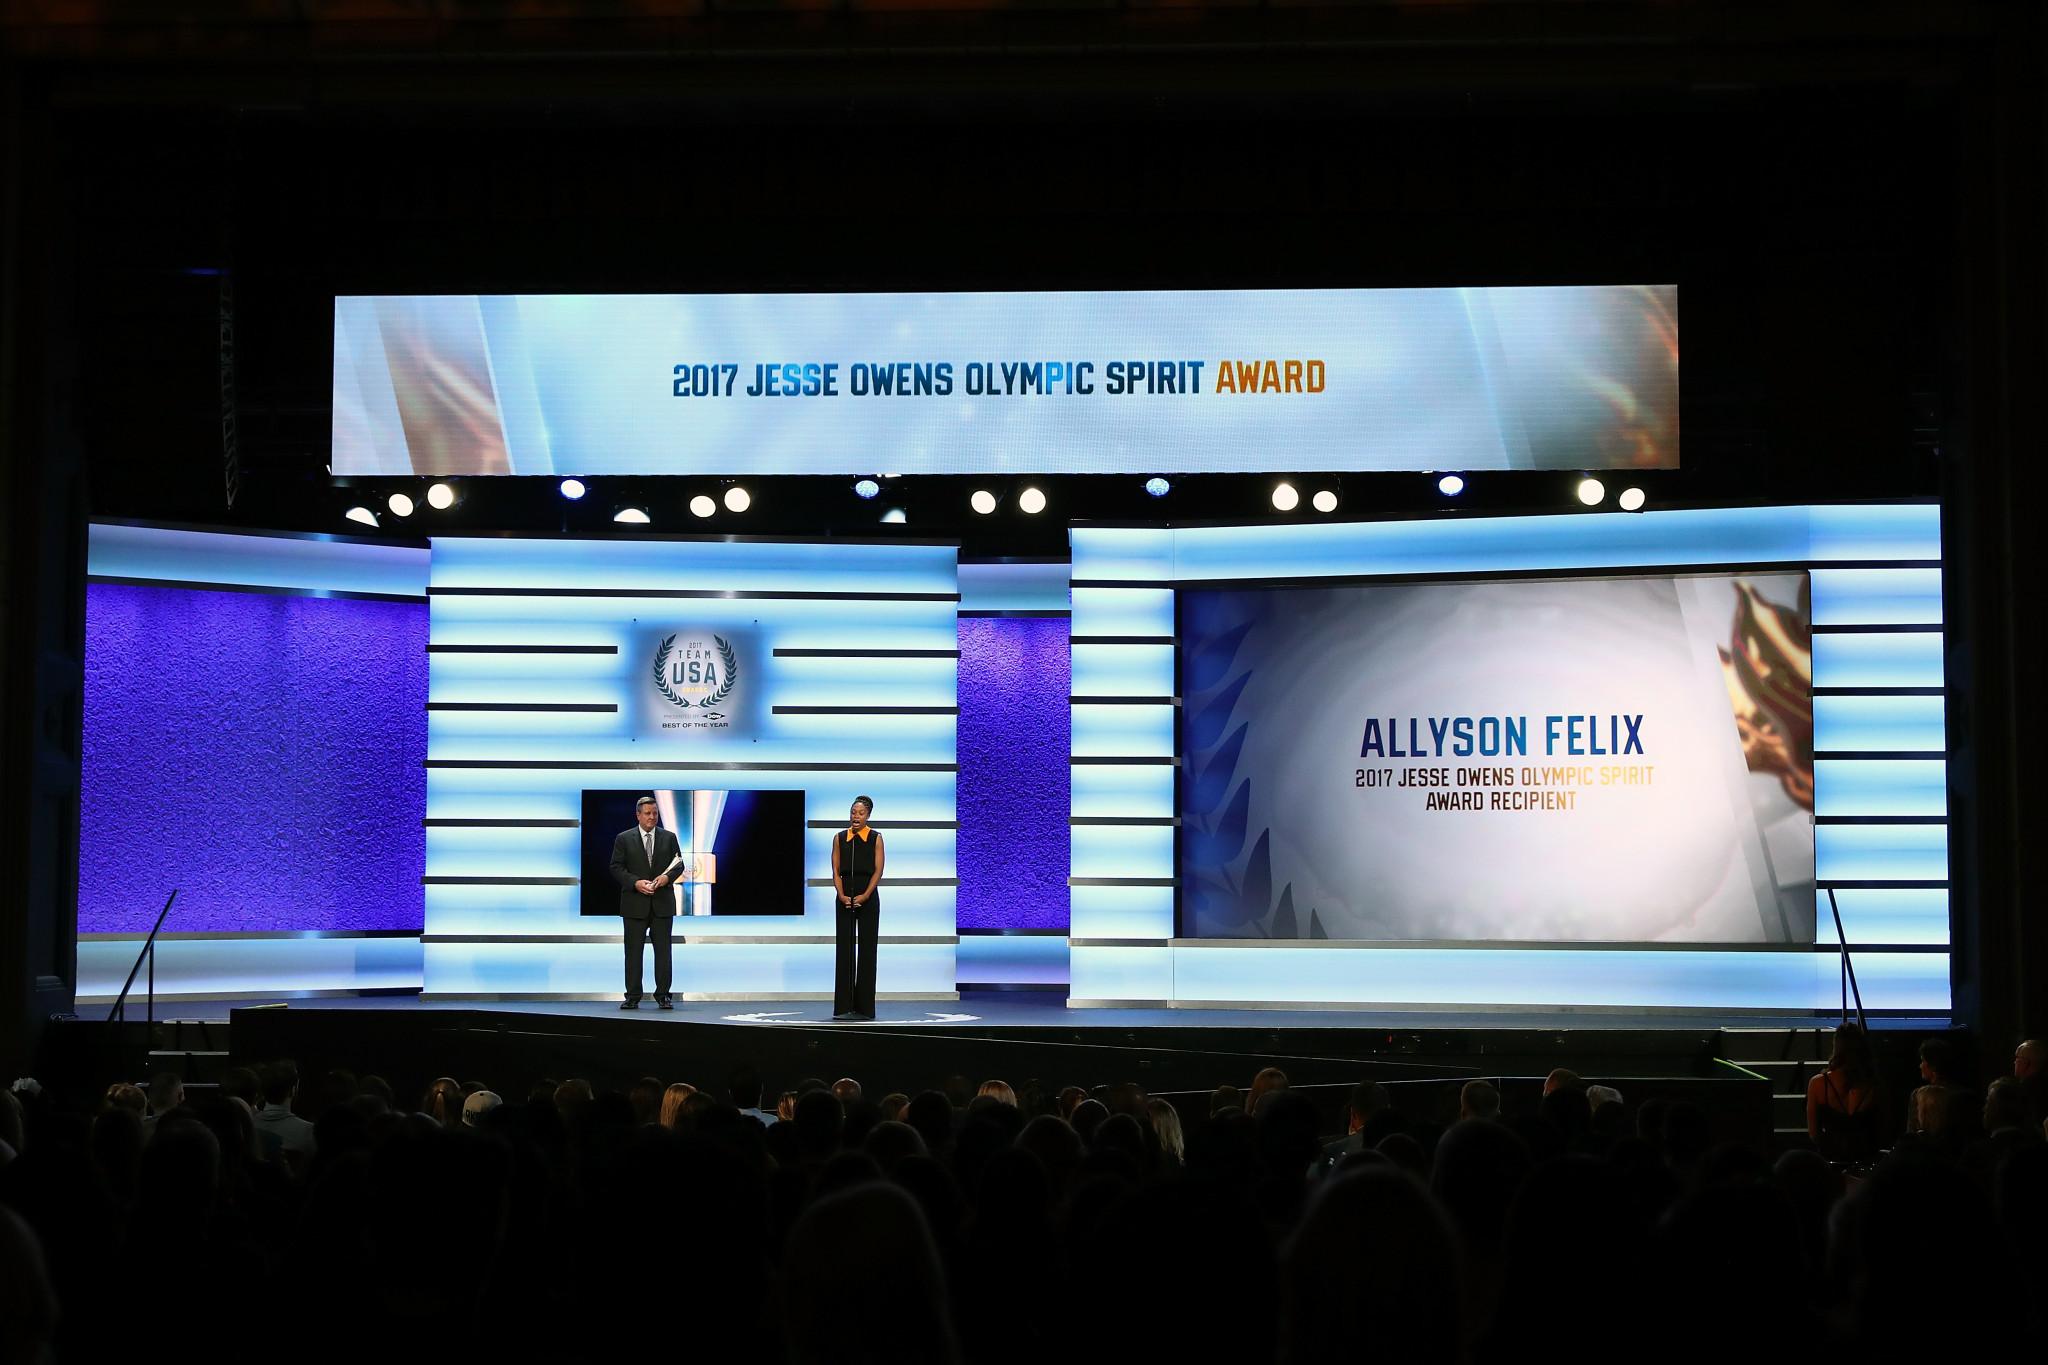 Allyson Felix won the Jesse Owens Olympic Spirit Award ©Getty Images